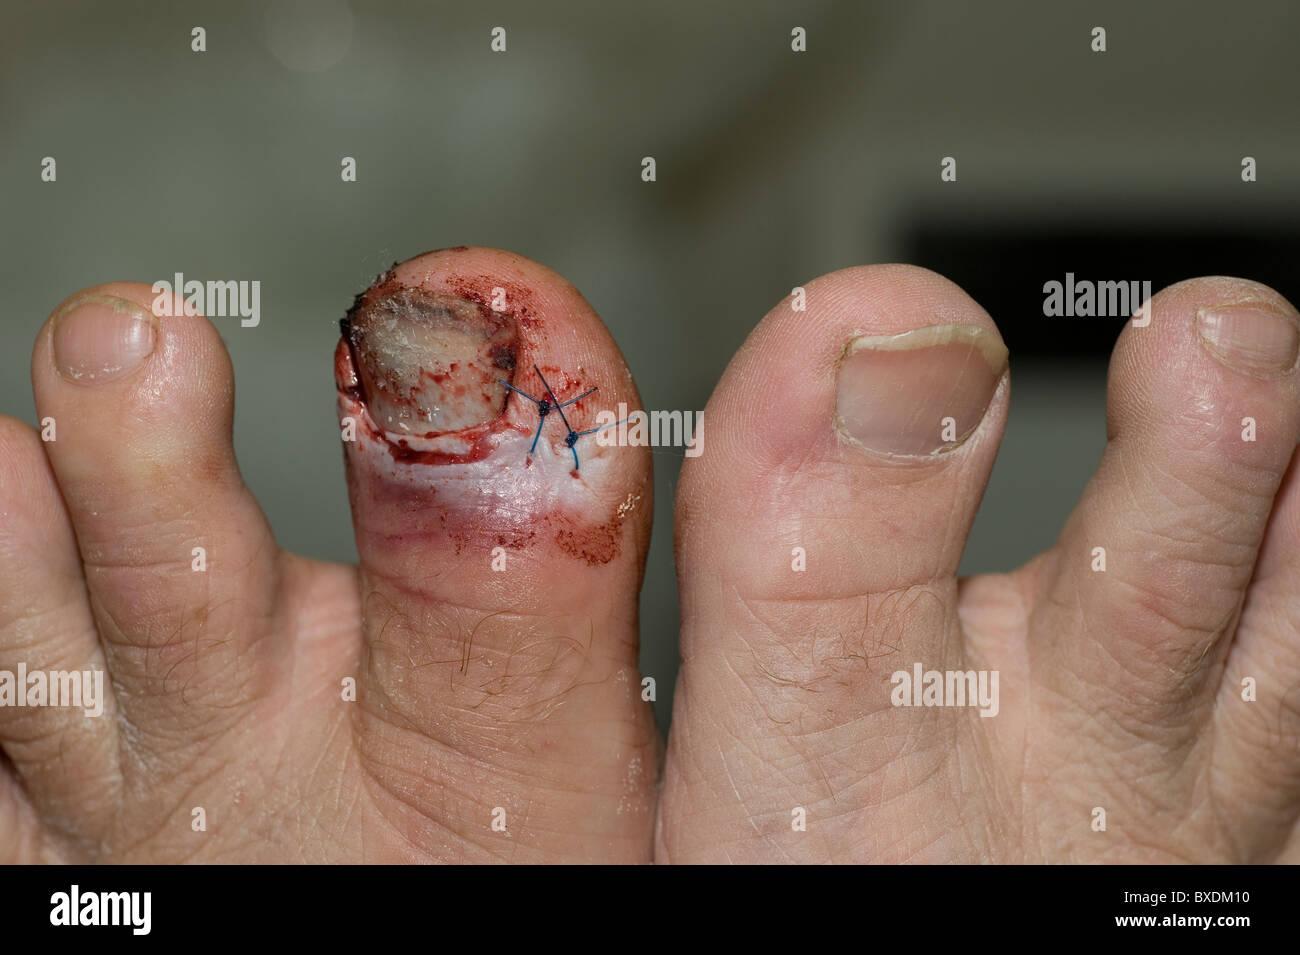 injured toe - Stock Image